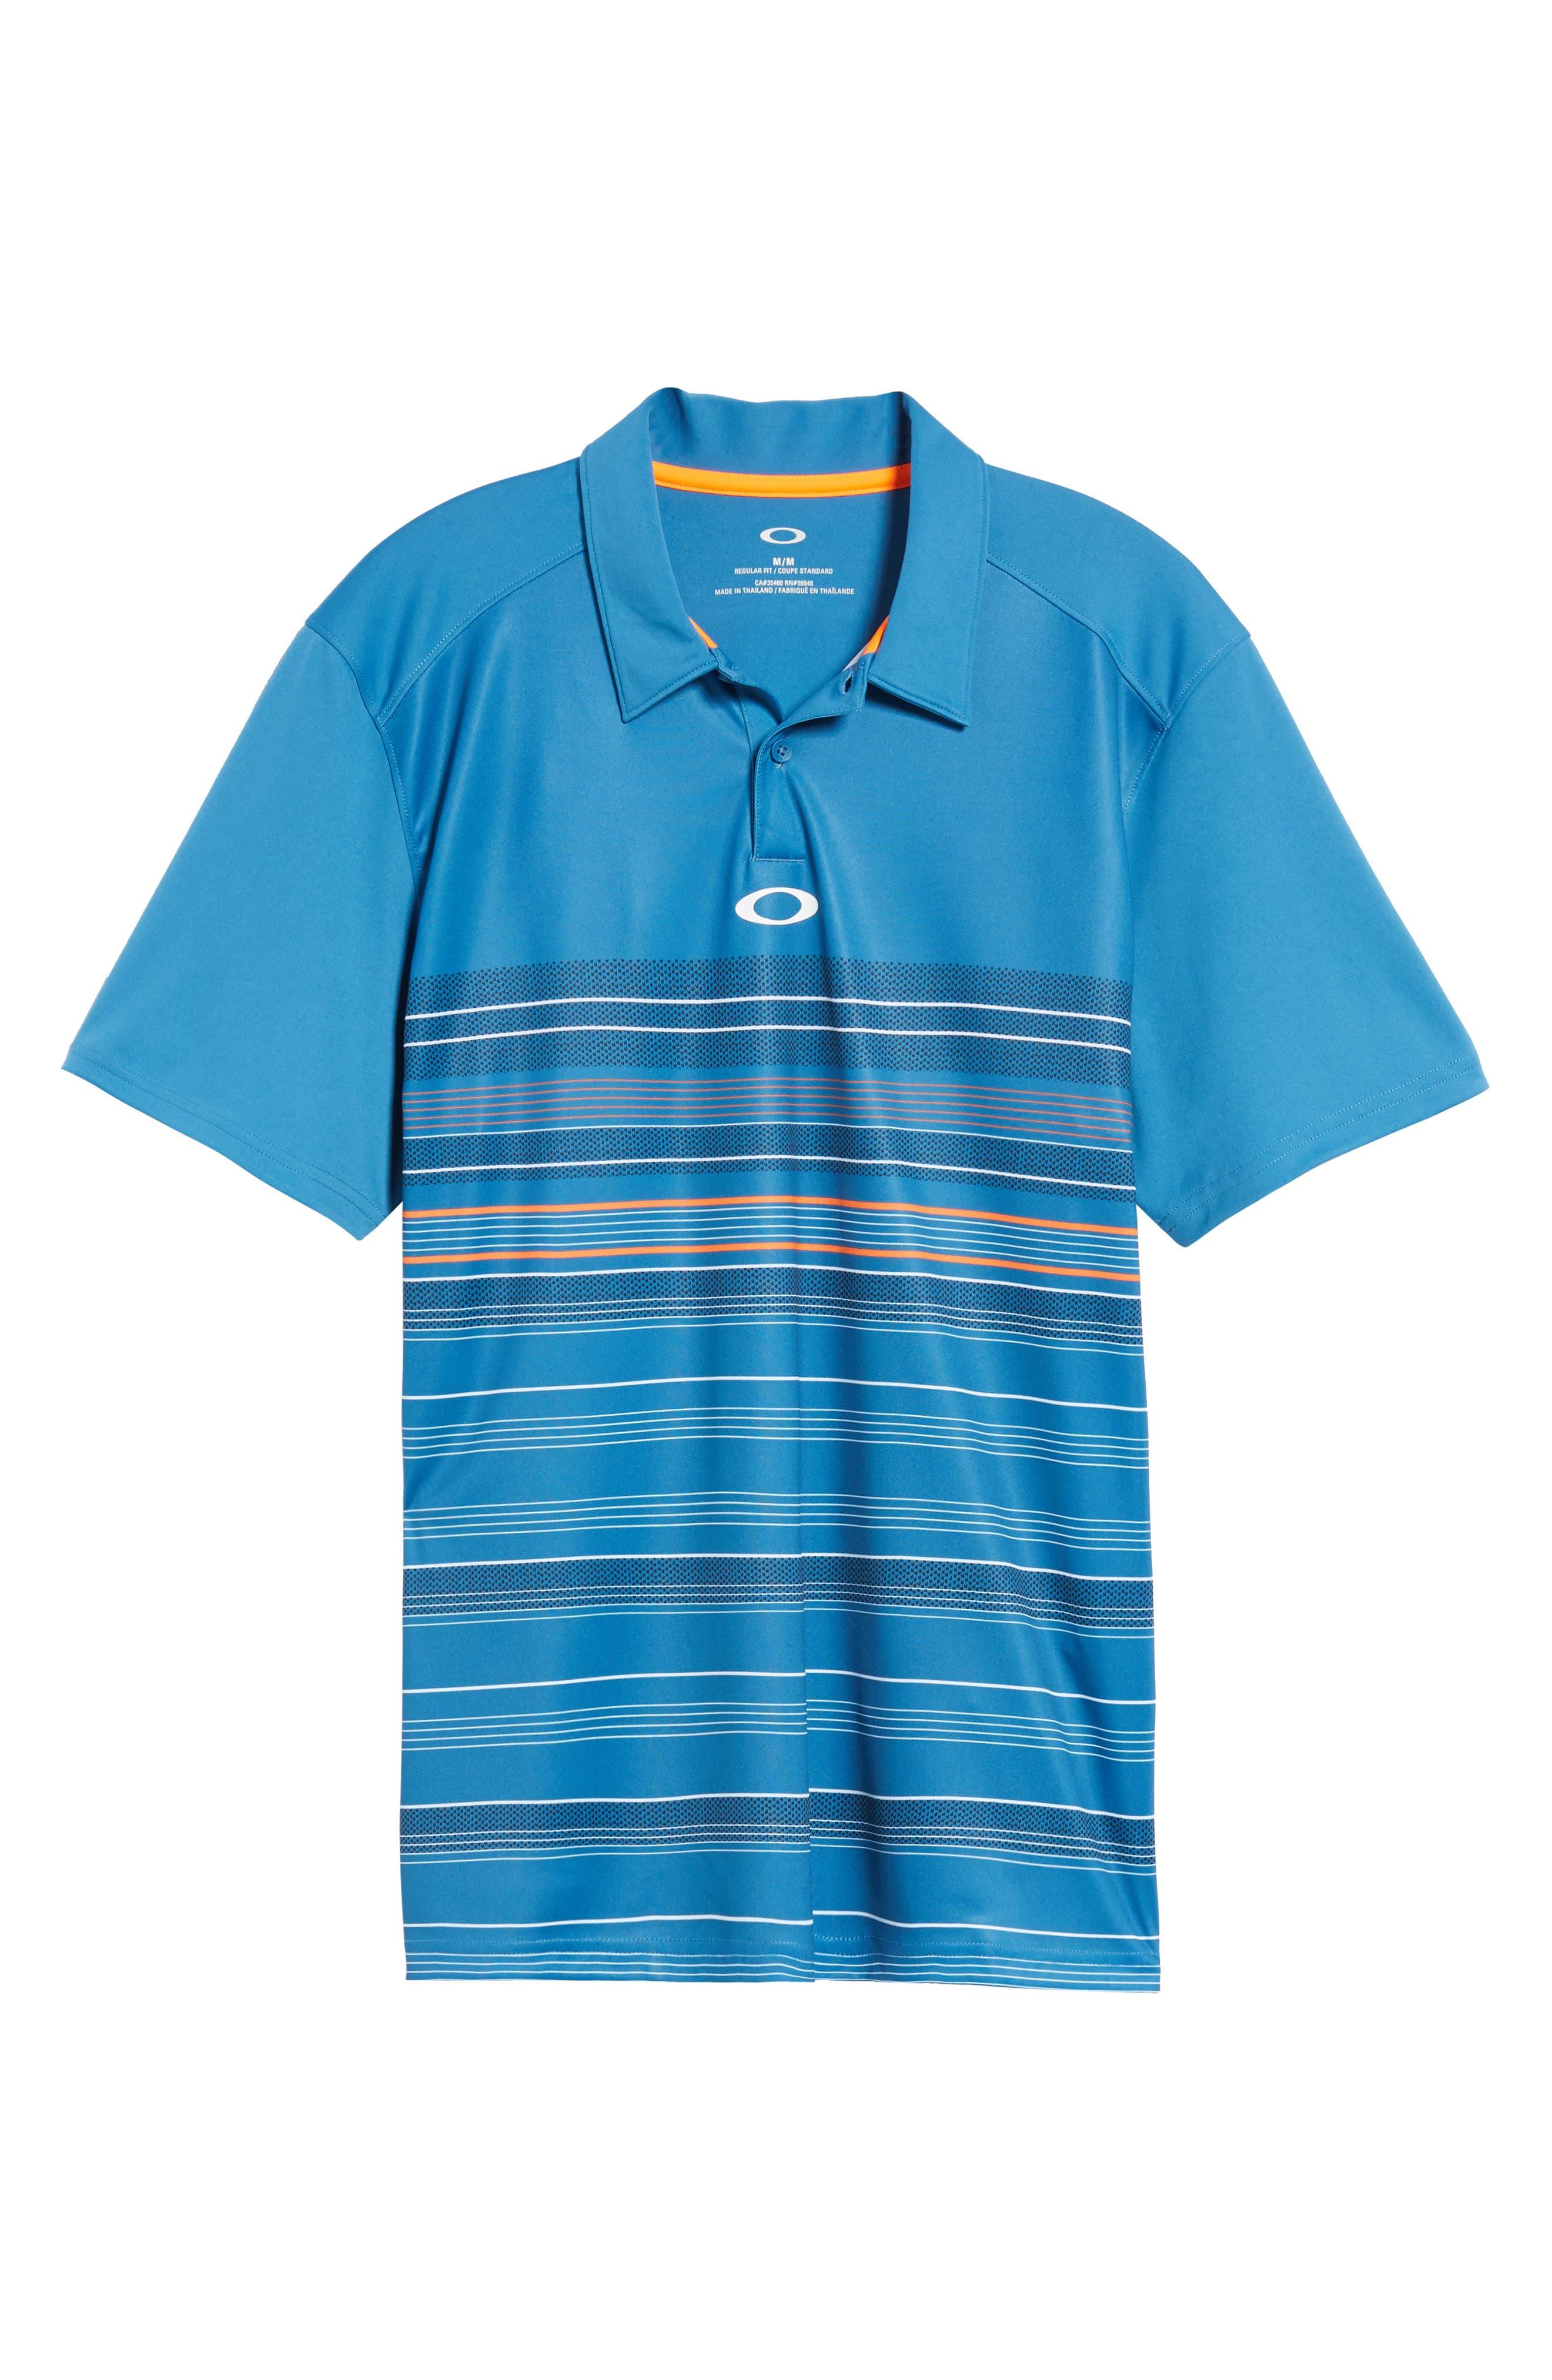 High Crest Polo Shirt,                             Alternate thumbnail 24, color,